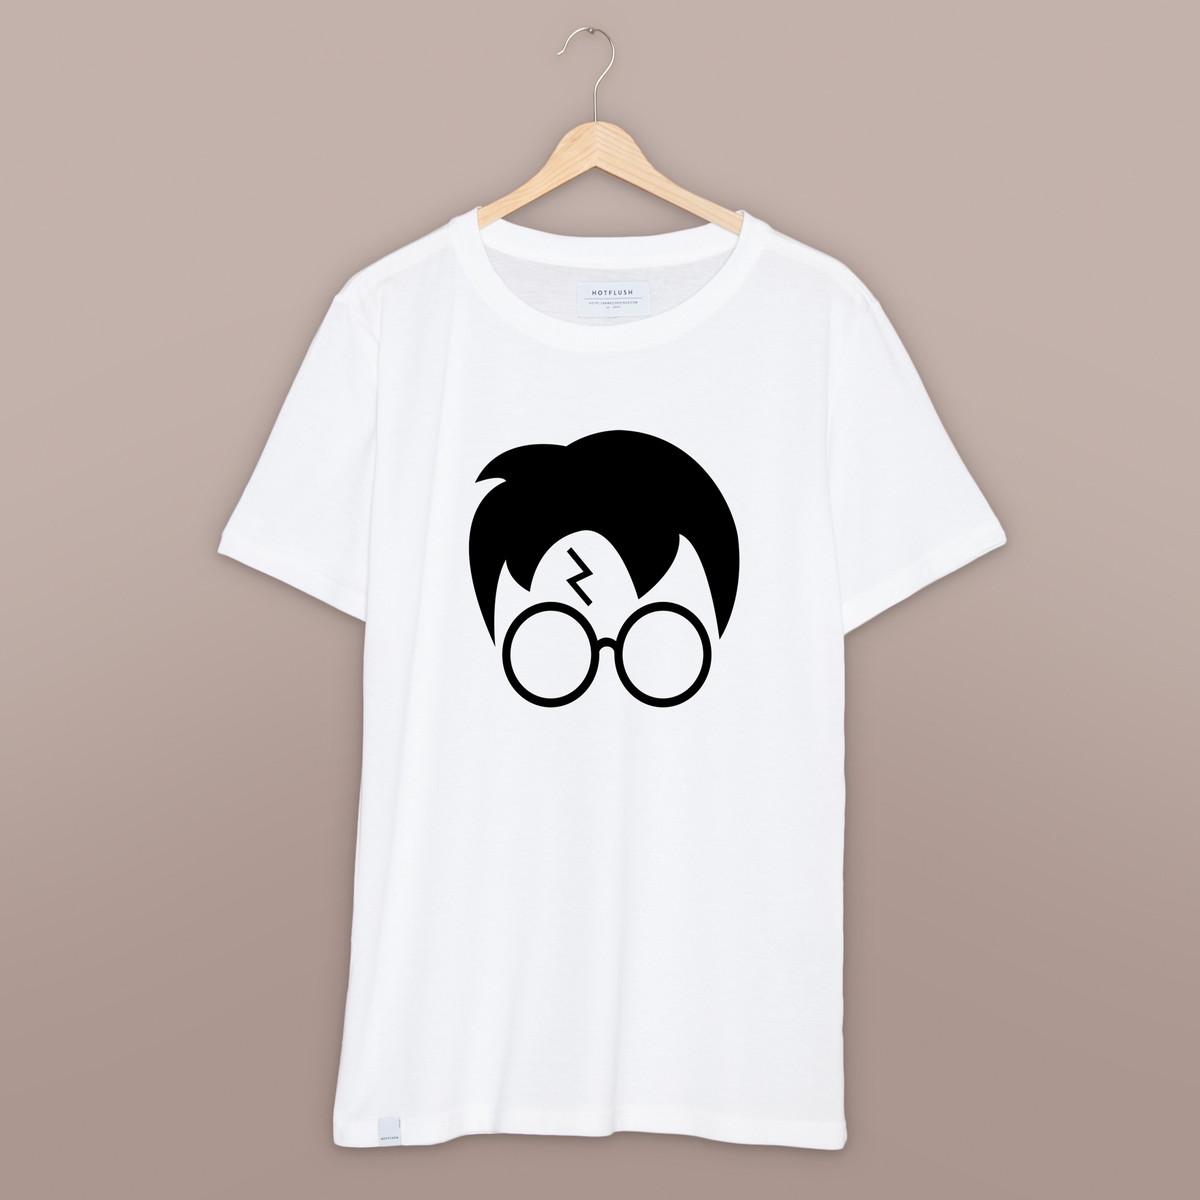 75fc5148f Camiseta Camisa Harry Potter no Elo7